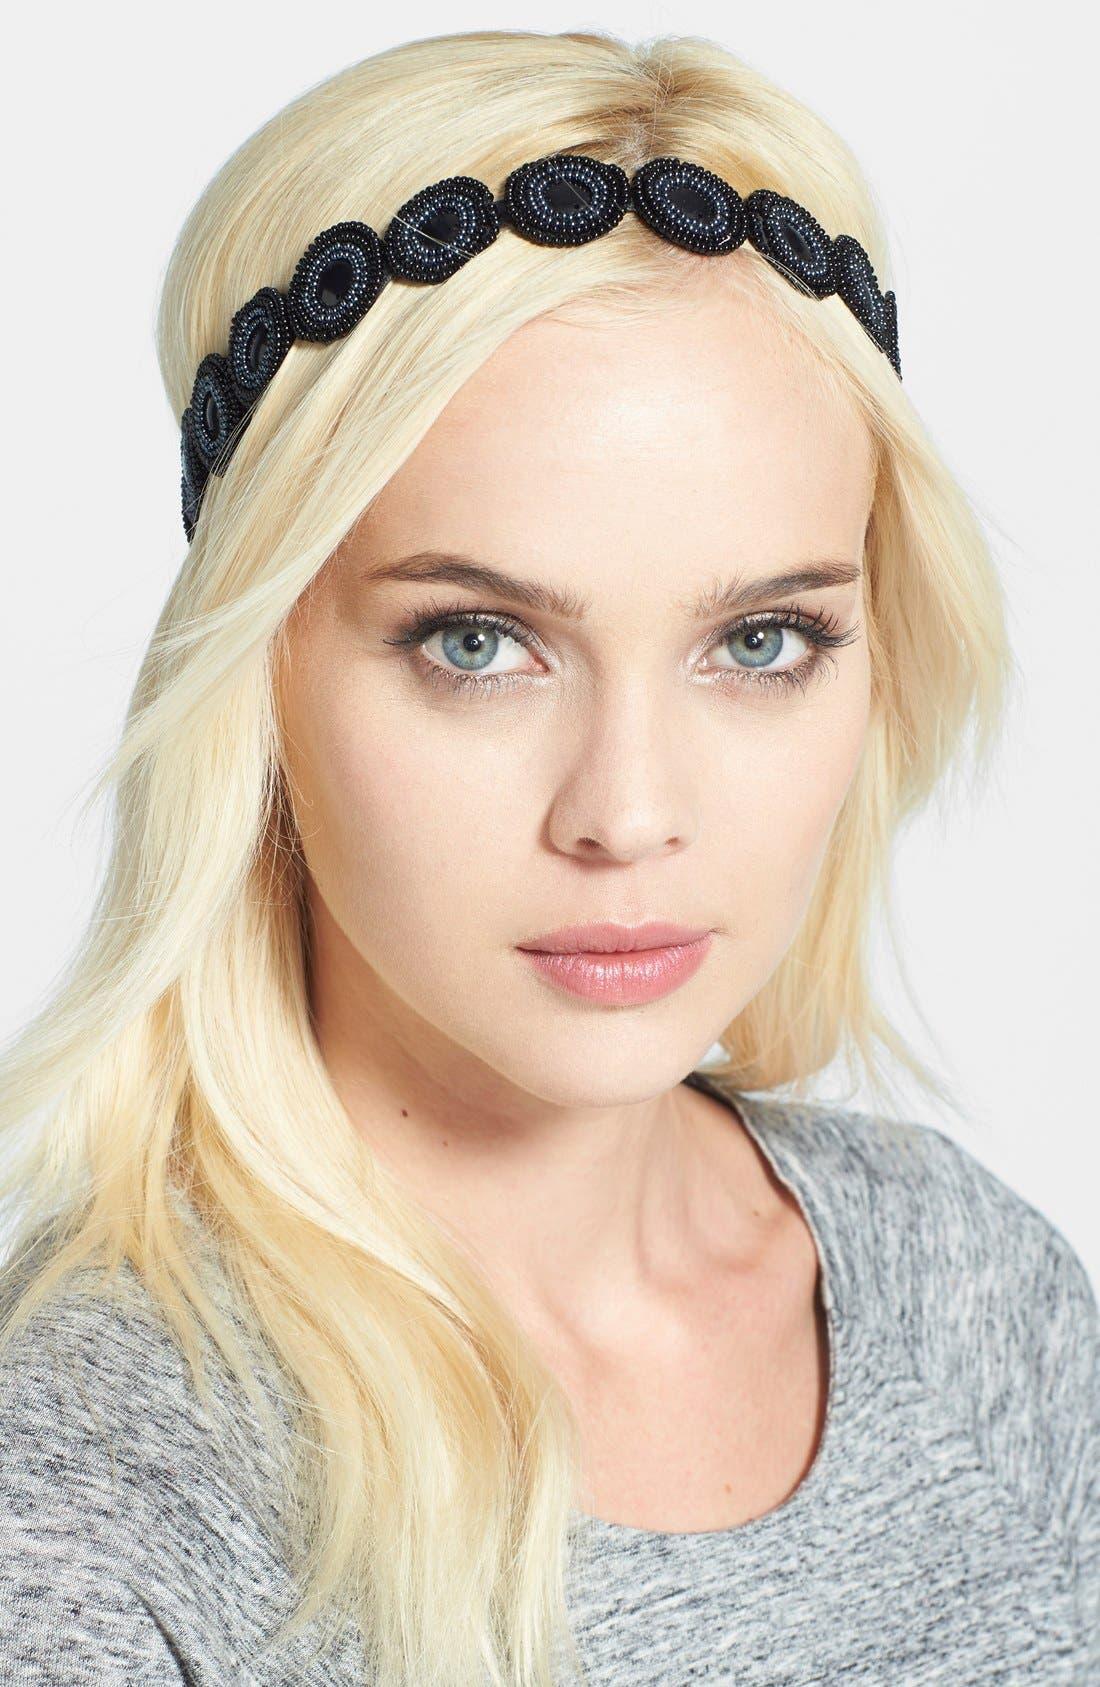 Alternate Image 1 Selected - Tasha 'Beaded in Glamour' Head Wrap